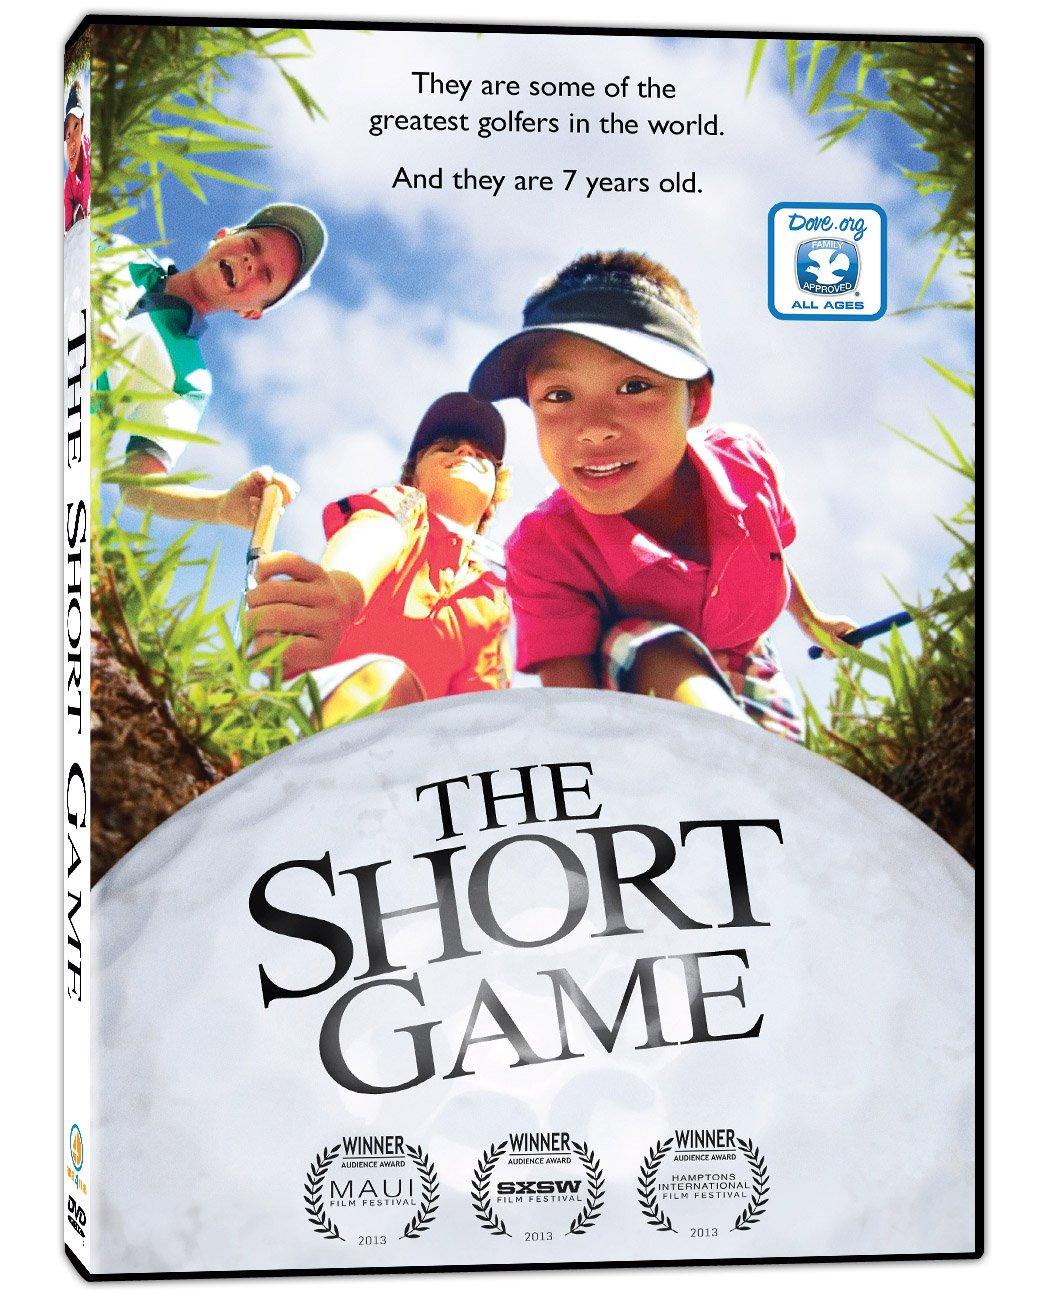 Amazon.com: The Short Game: Amari Avery, Jed Dy, Allan Kournikova,  Zamokuhle Nxasana, Josh Greenbaum: Movies & TV